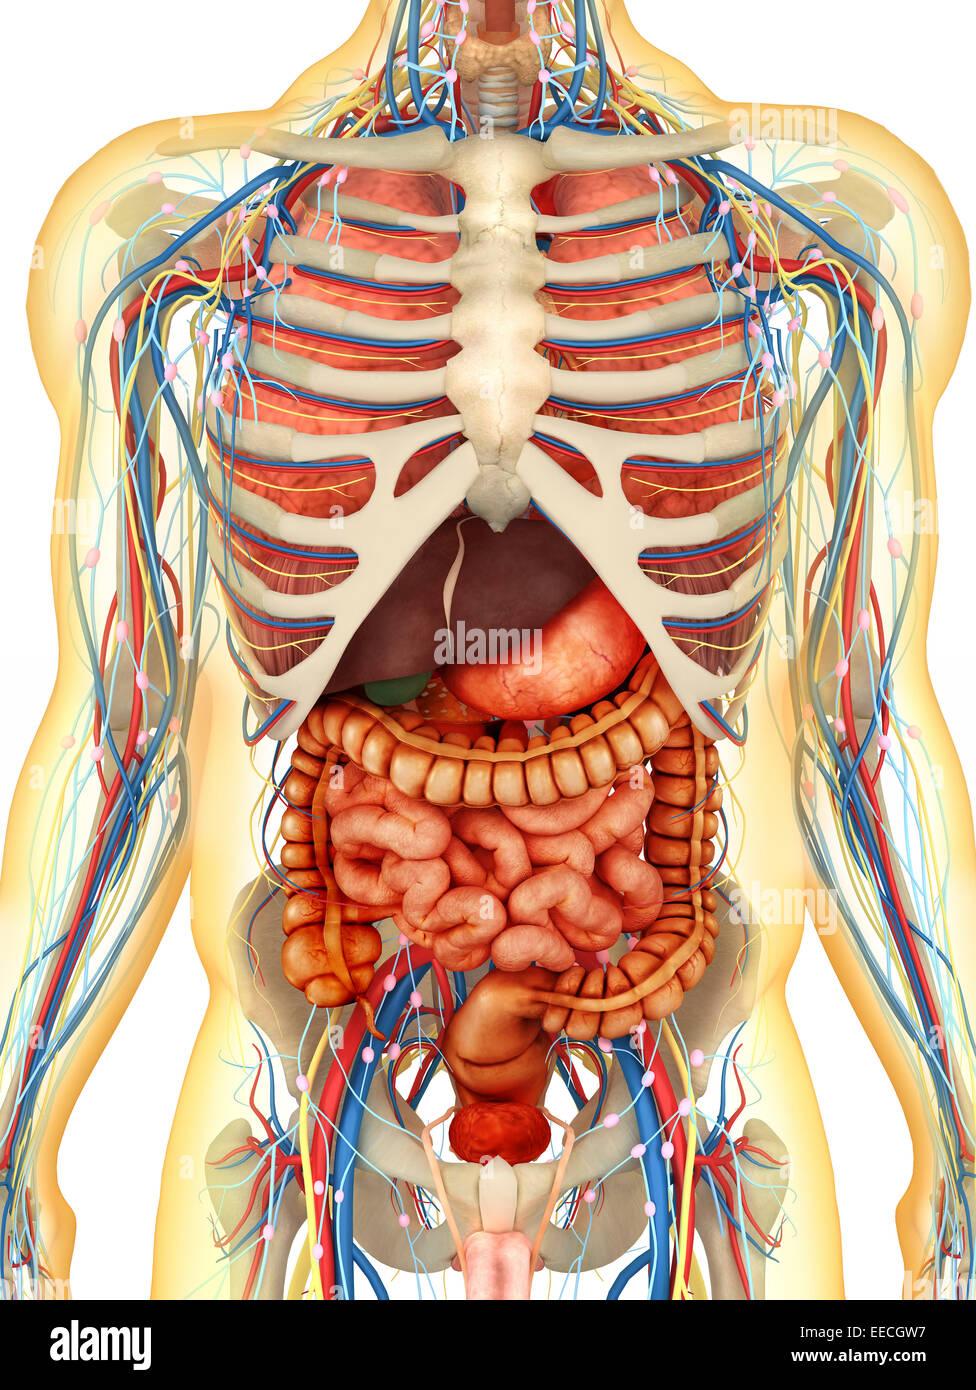 Transparent human body with internal organs nervous system stock transparent human body with internal organs nervous system lymphatic system and circulatory system ccuart Choice Image